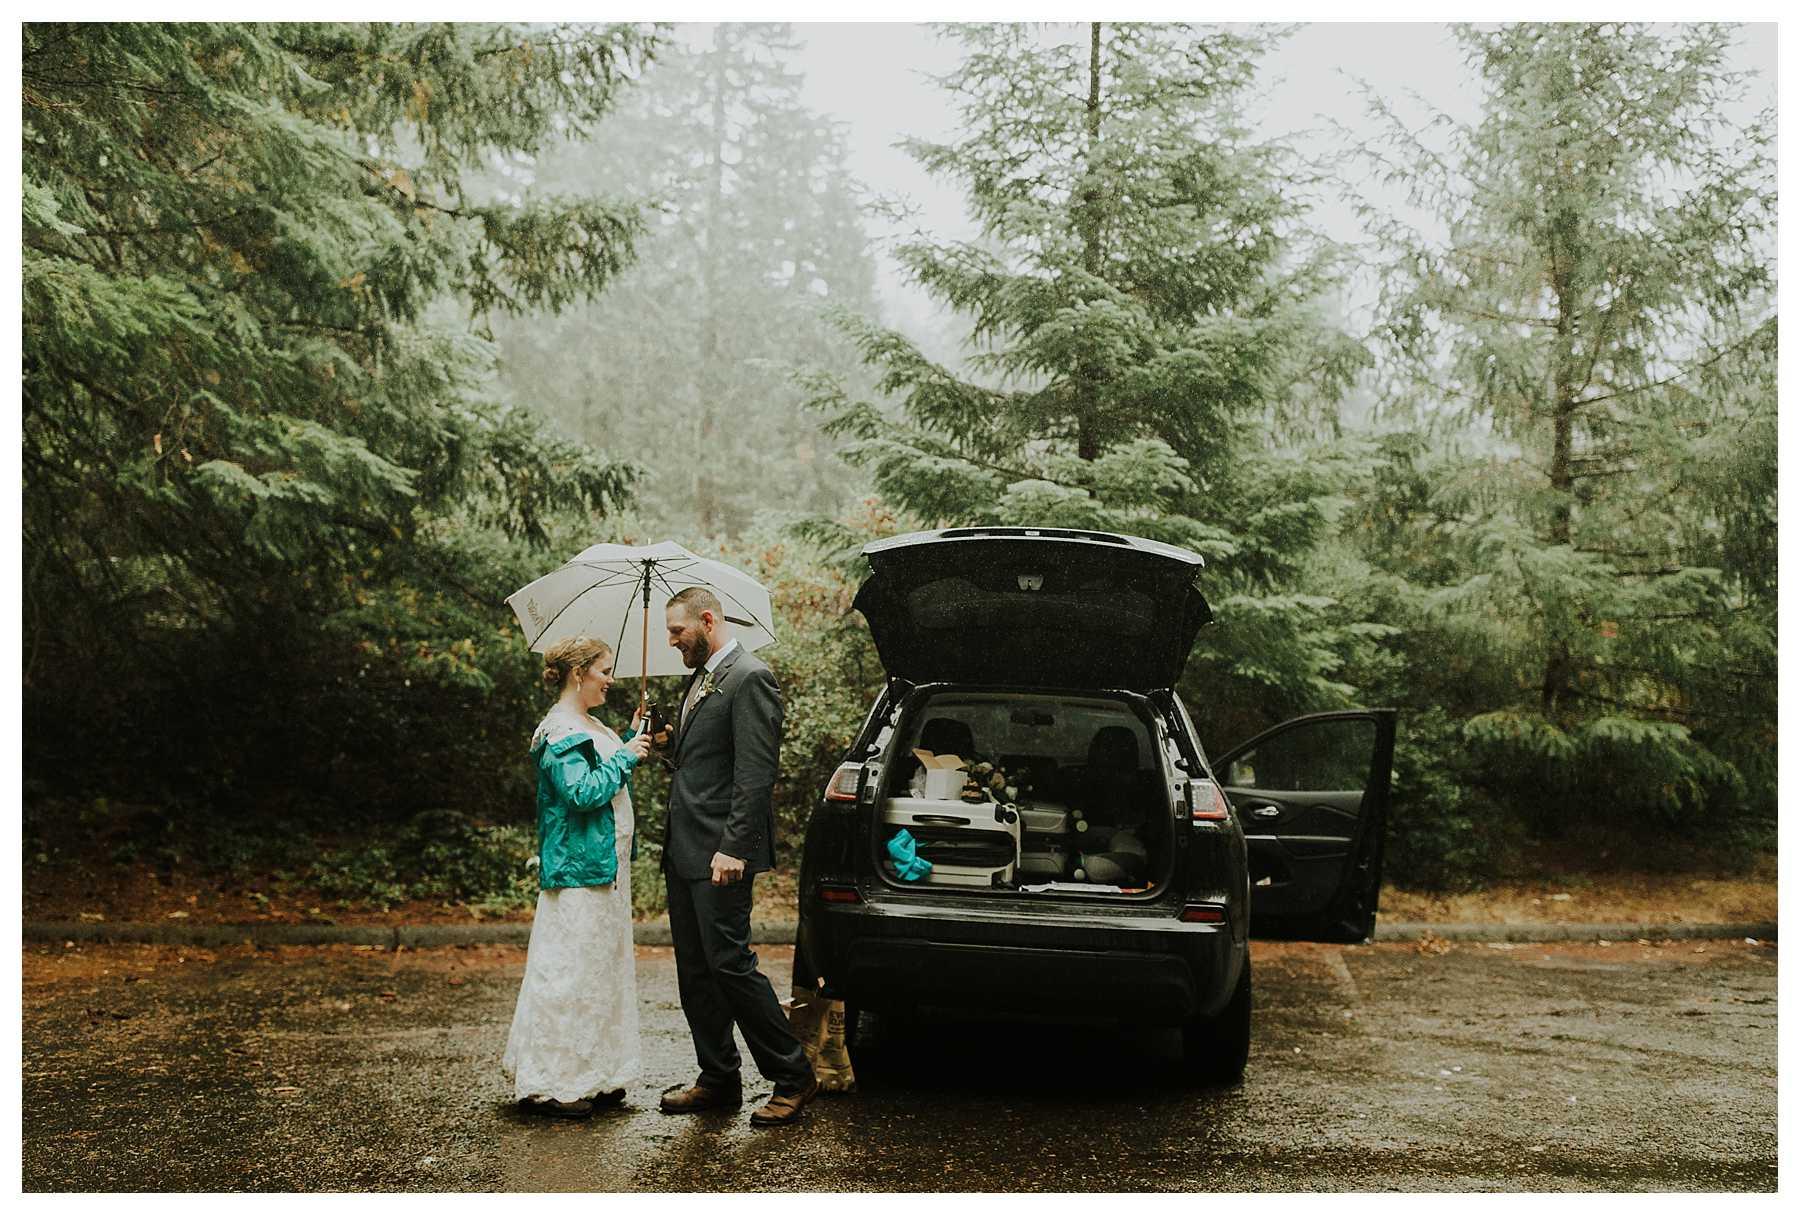 Oregon_Waterfall_Elopement_0056.jpg